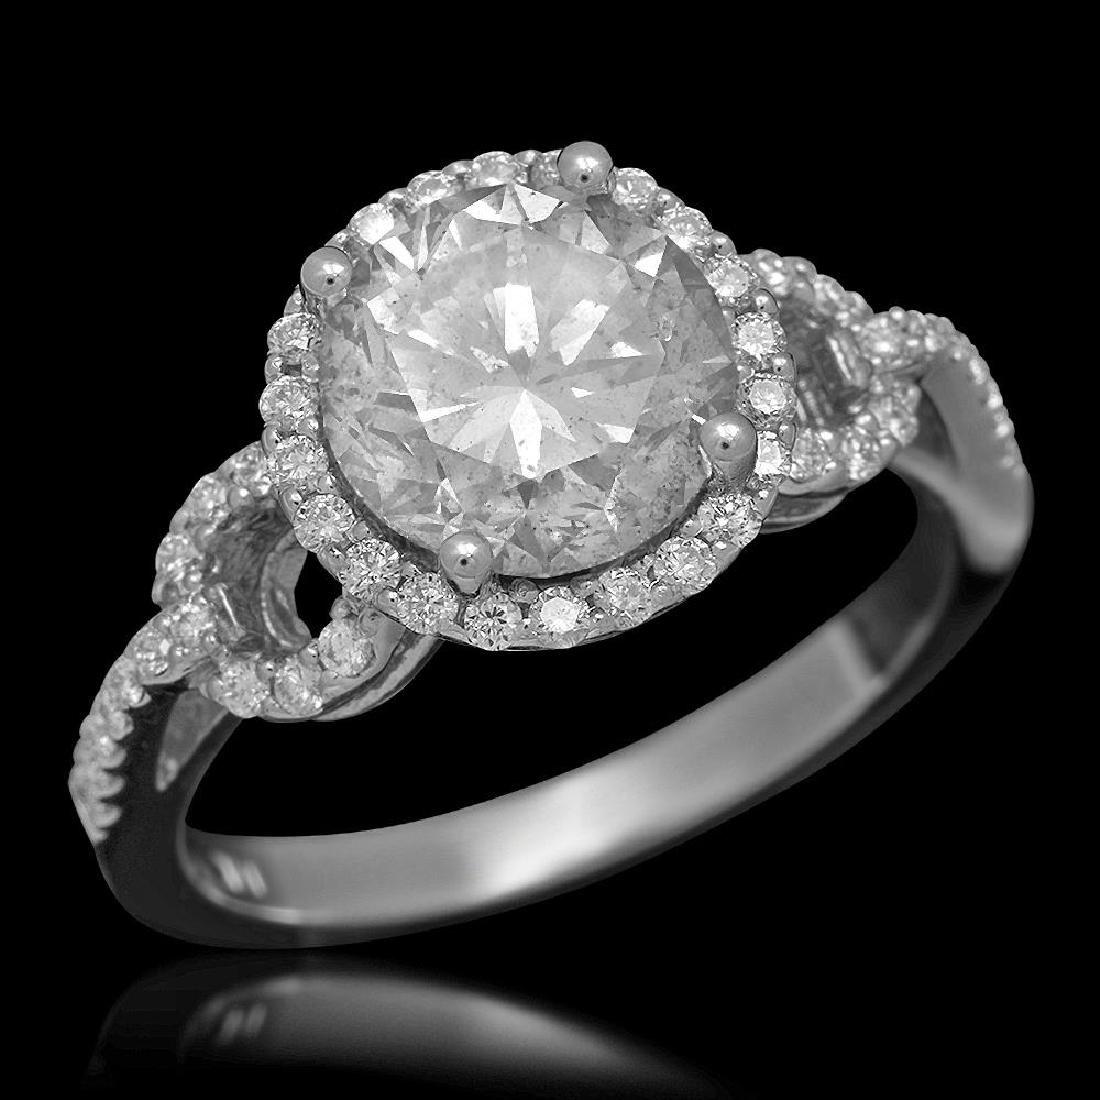 14K Gold 2.73ct Diamond Ring